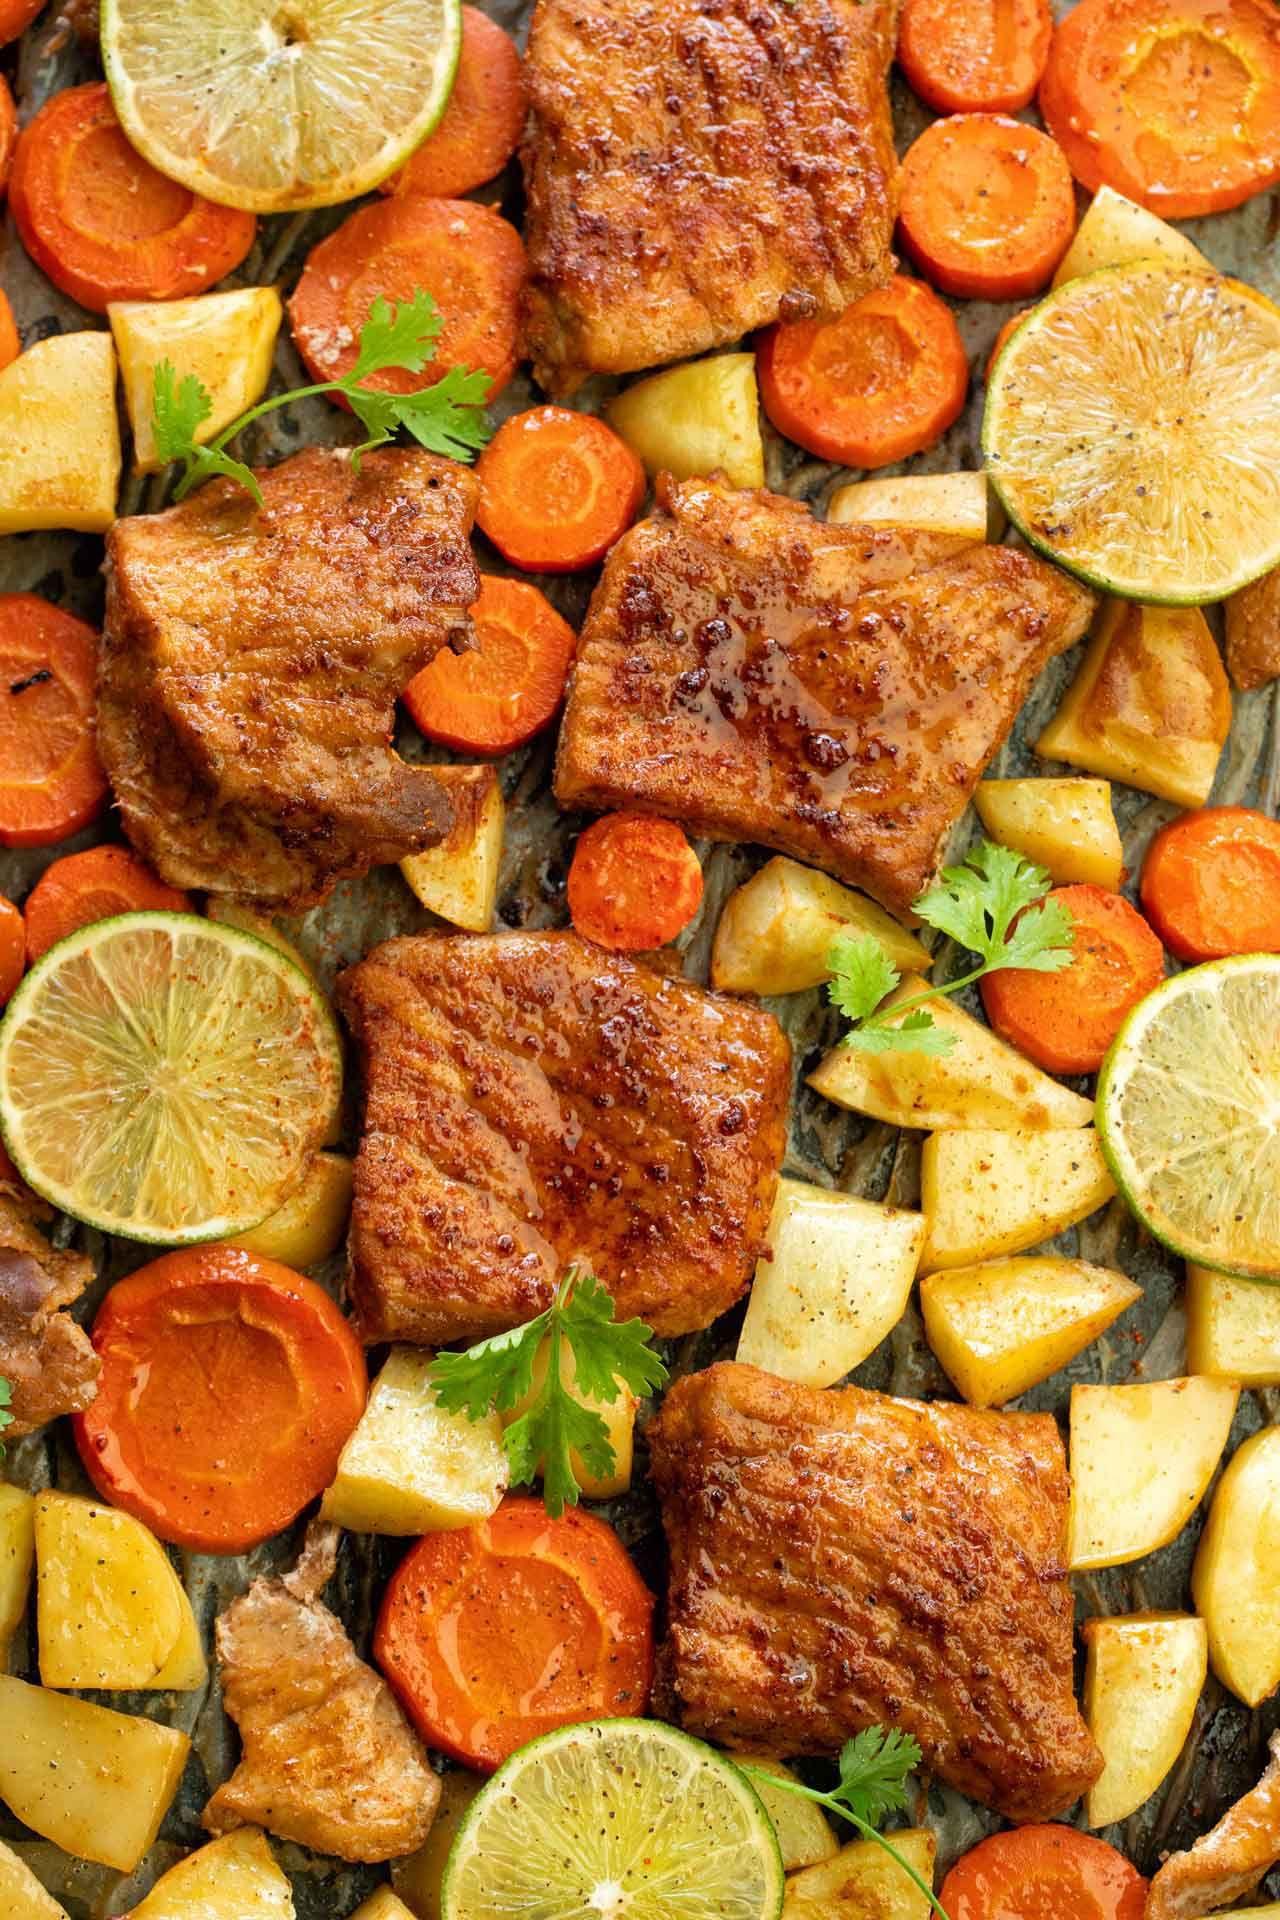 baked Pork Chops recipe